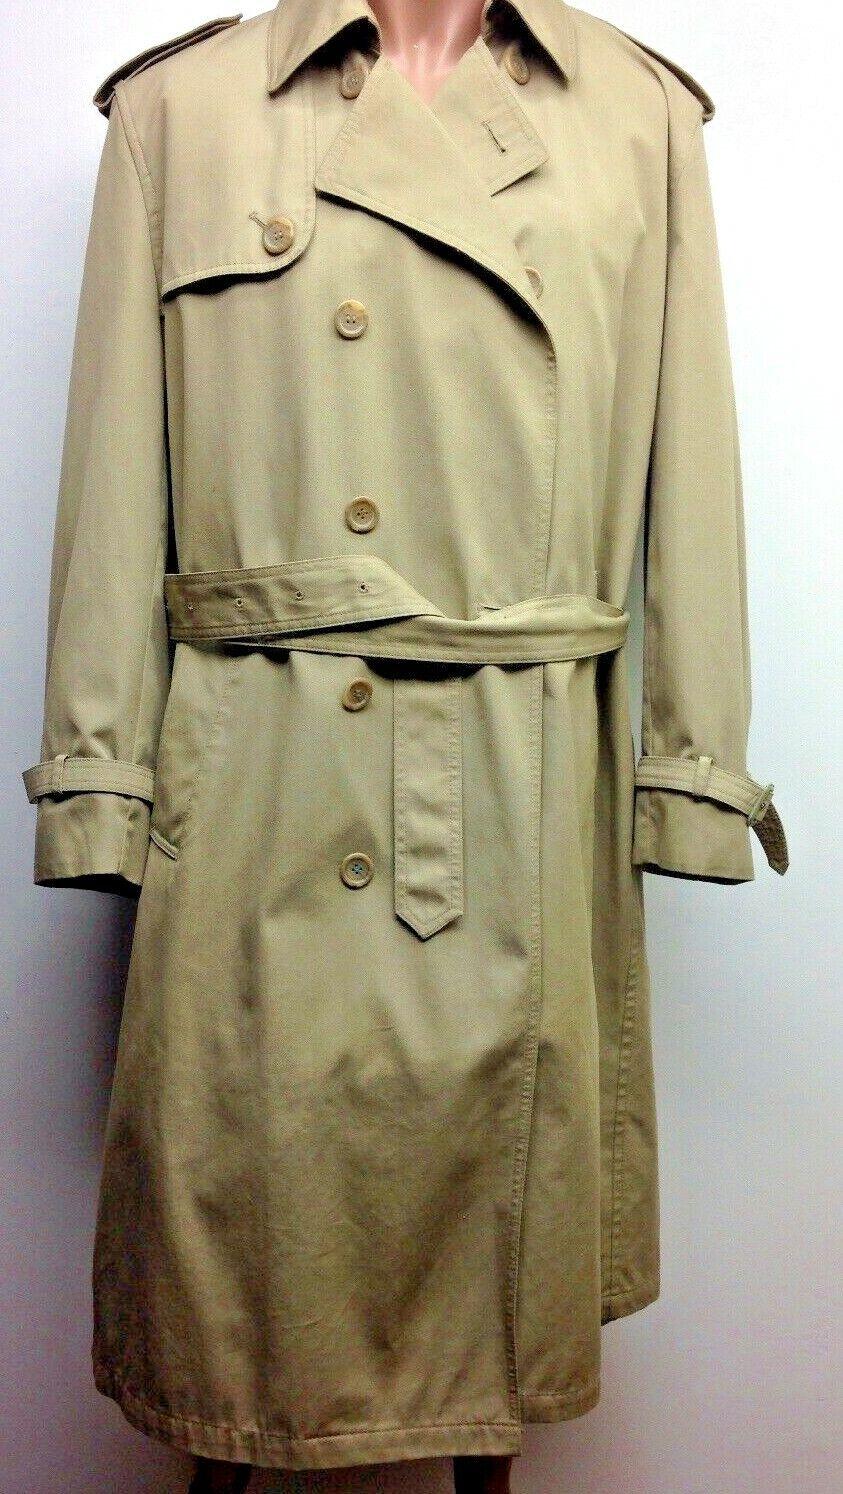 OLEG OLEG CASSINI Mens Tan belted trench coat removable faux fur liner 42 R